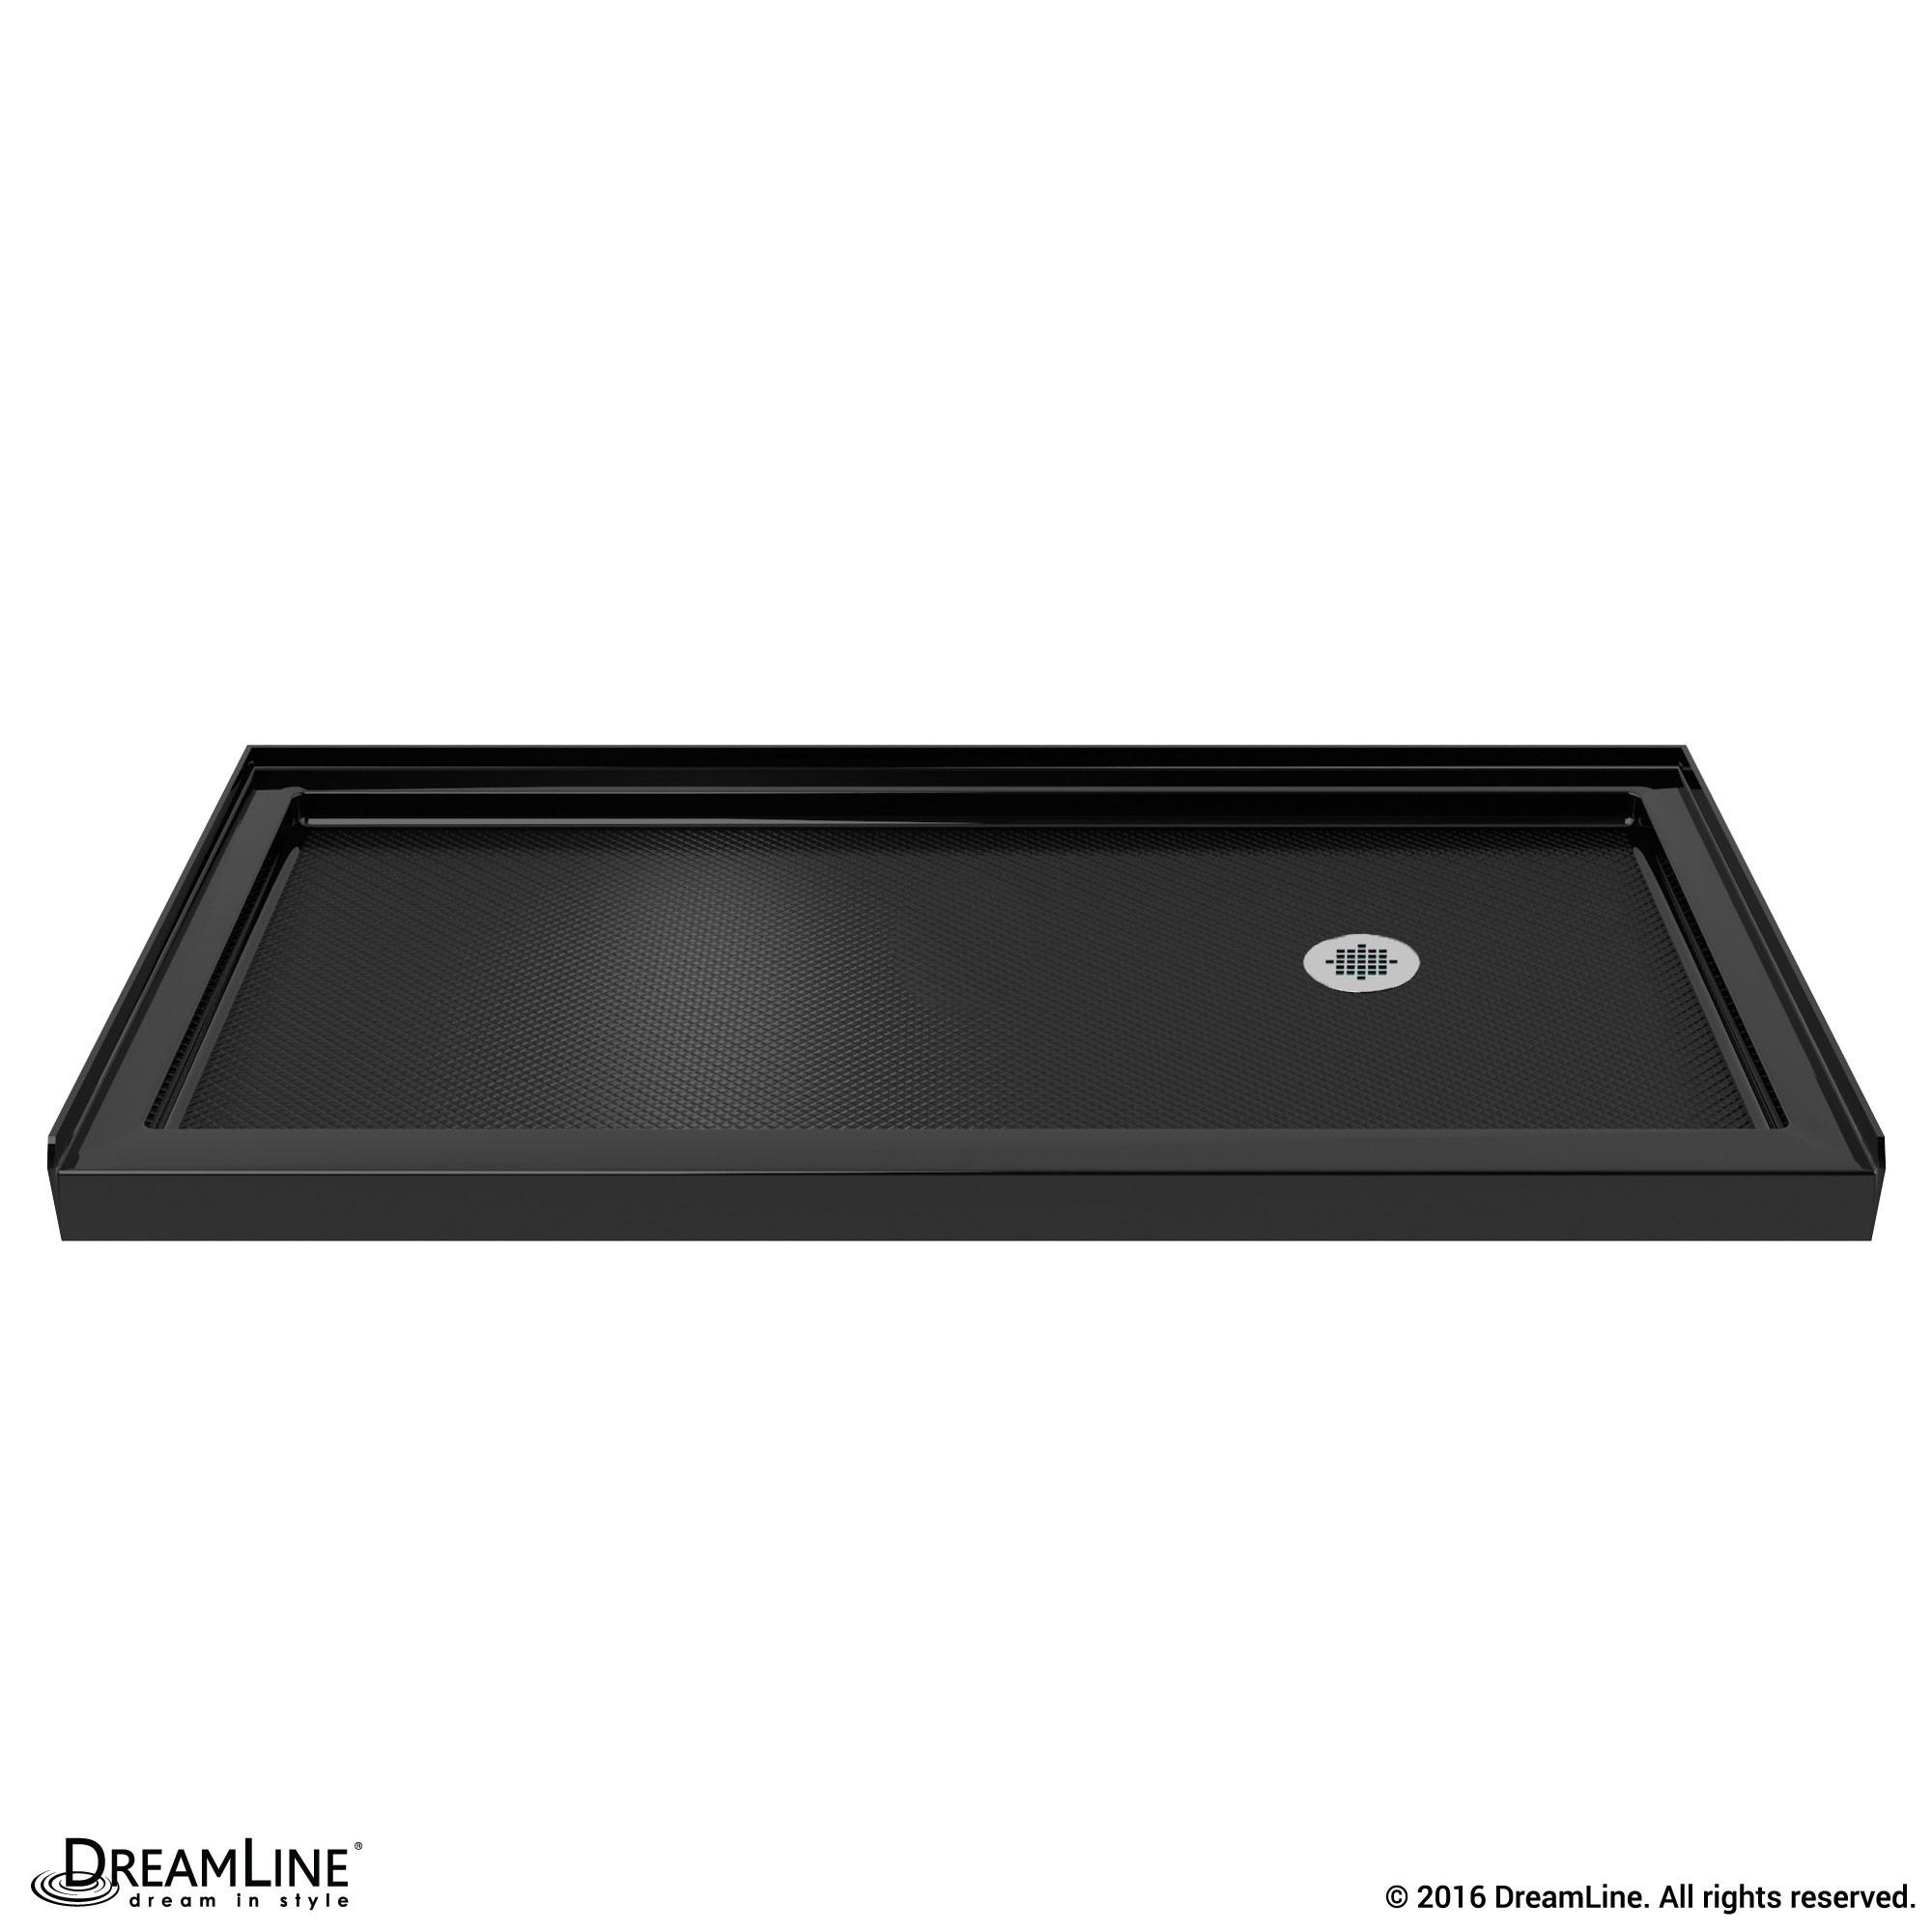 DreamLine DLT-1132602-88 SlimLine 32 Inch by 60 Inch Single Threshold Shower Base in Black Color Right Hand Drain